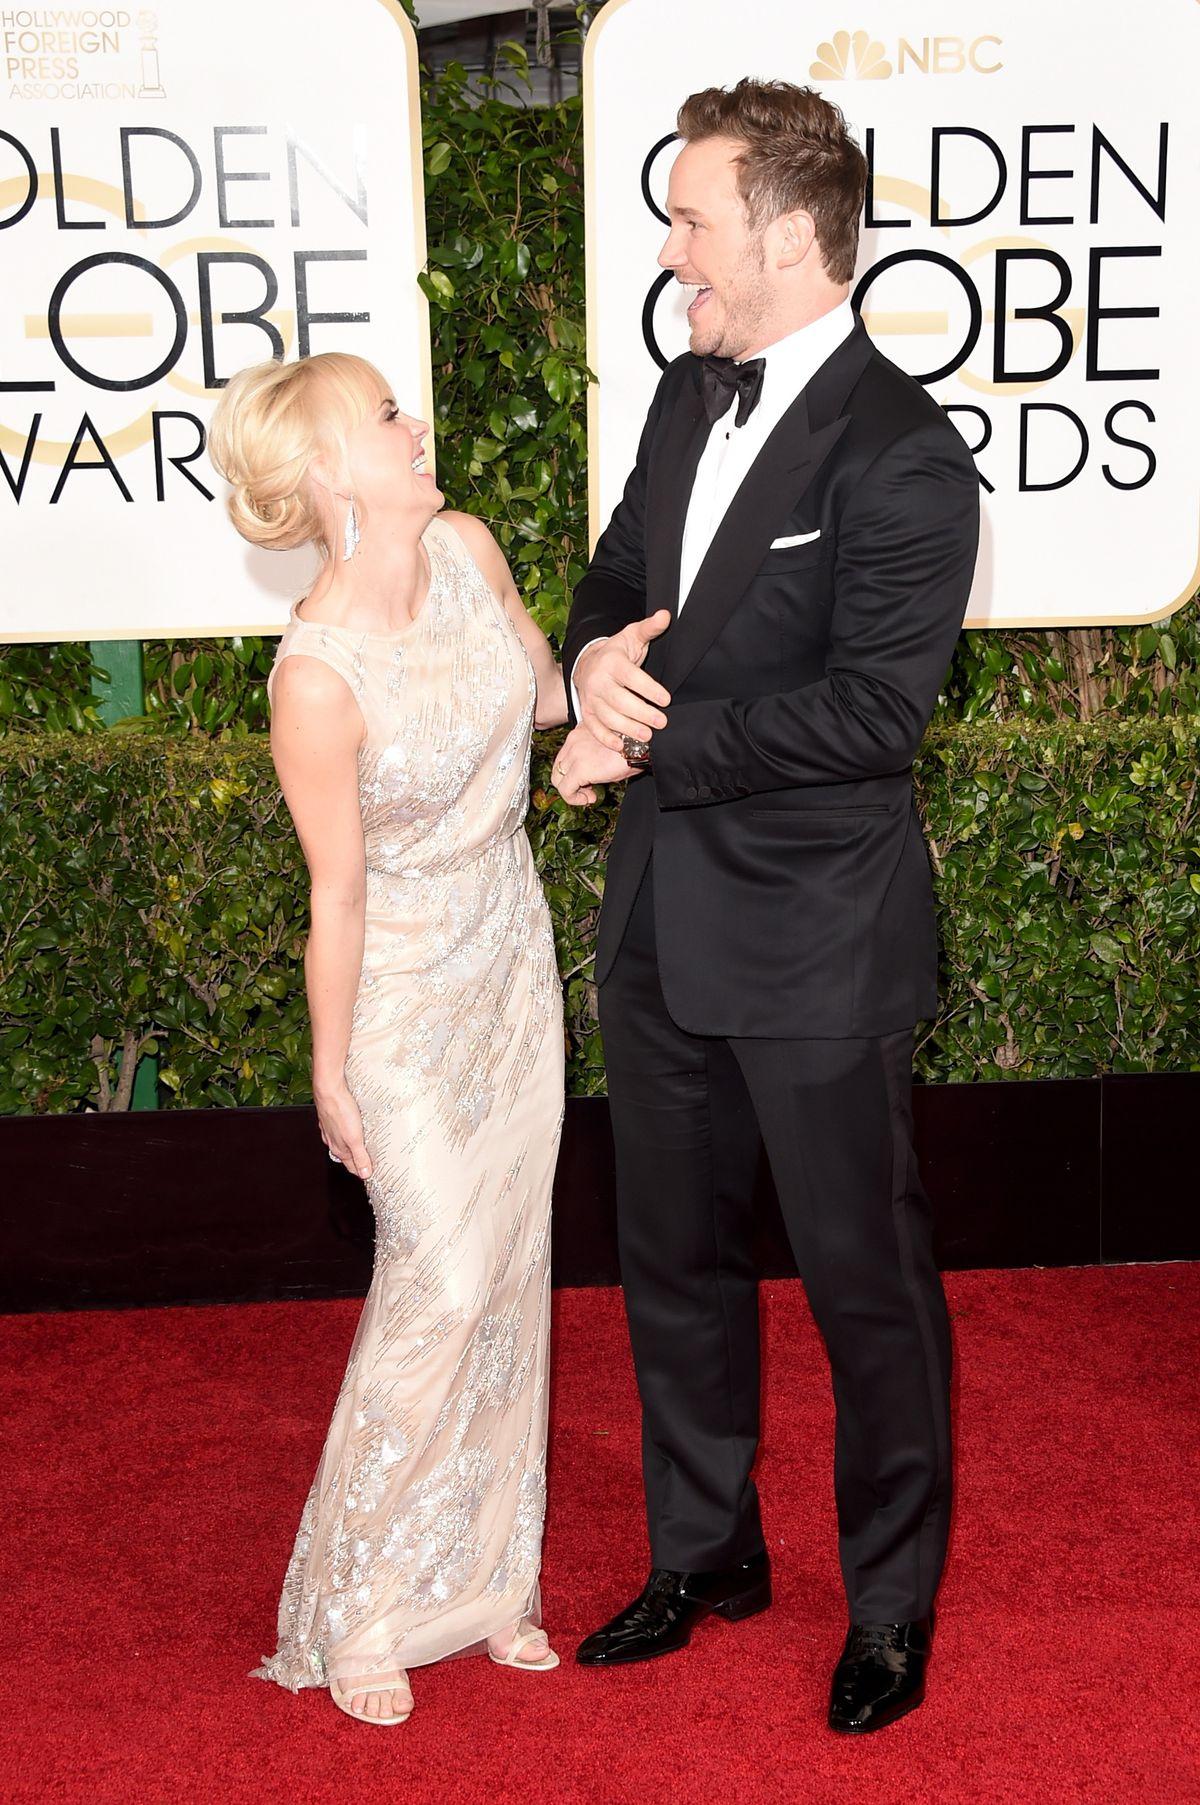 Chris Pratt and Anna Faris at 2015 Golden Globes